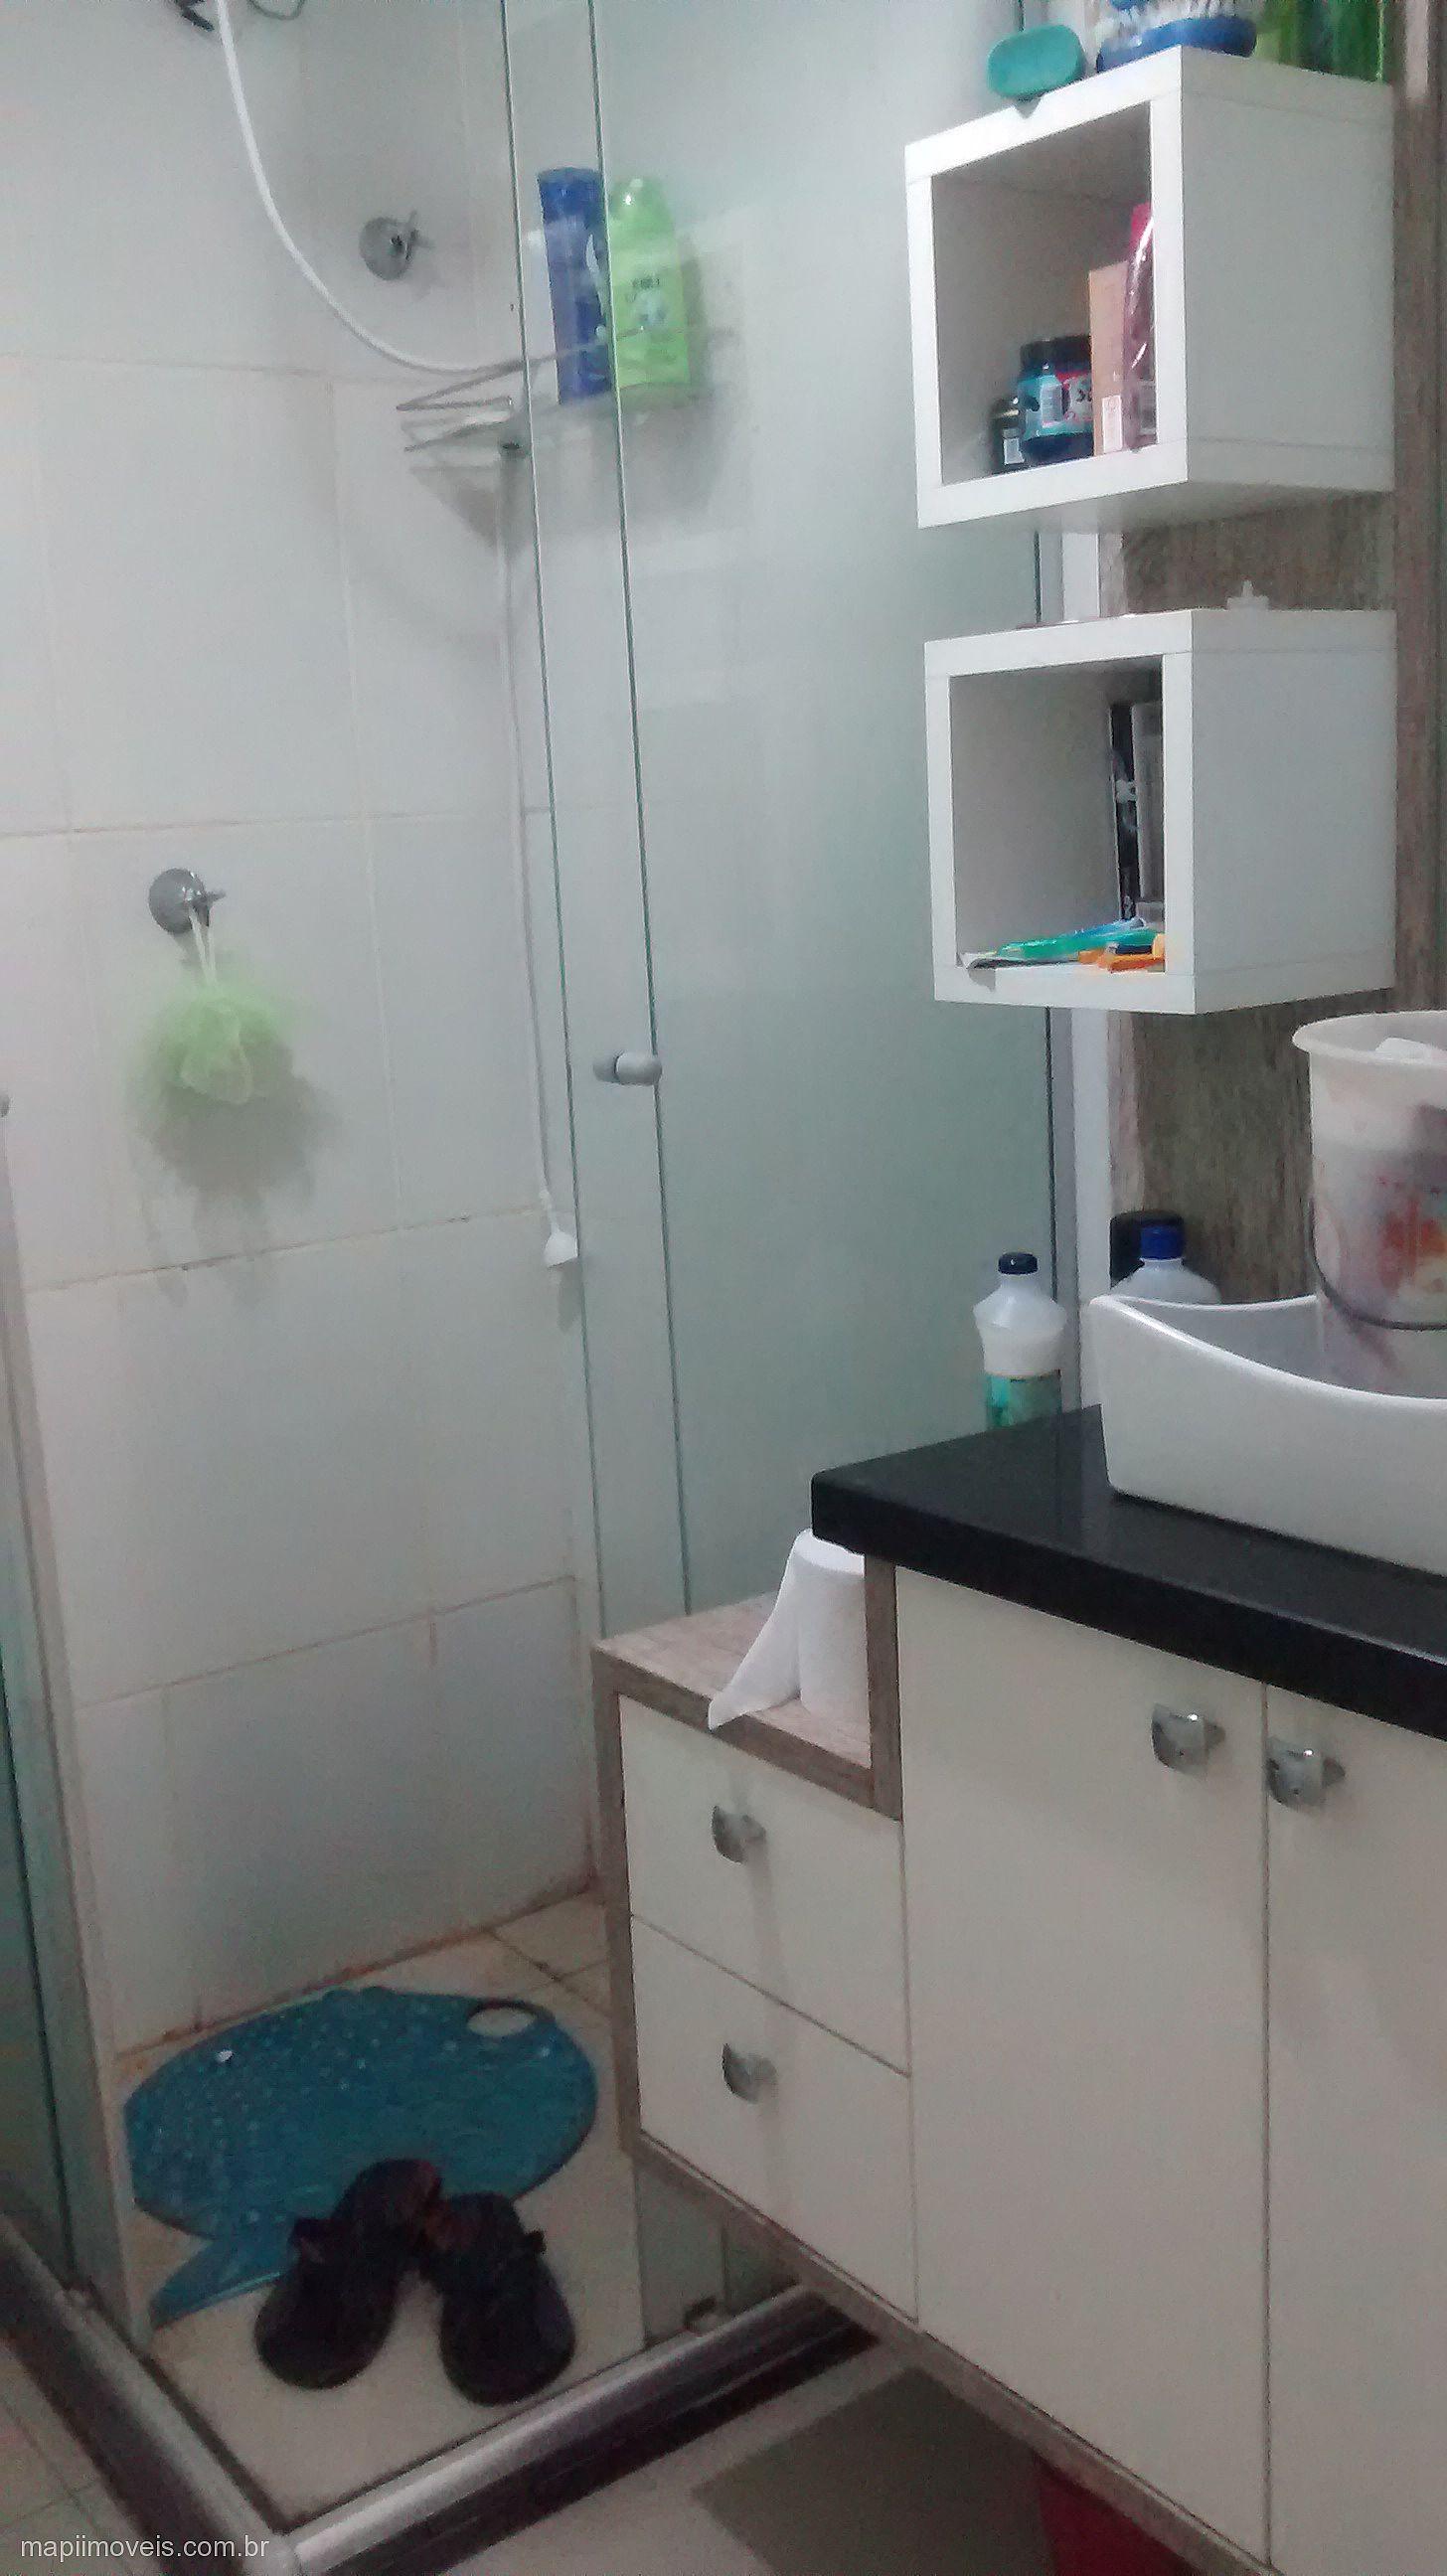 Mapi Imóveis - Apto 3 Dorm, Santos Dumont (284838) - Foto 9